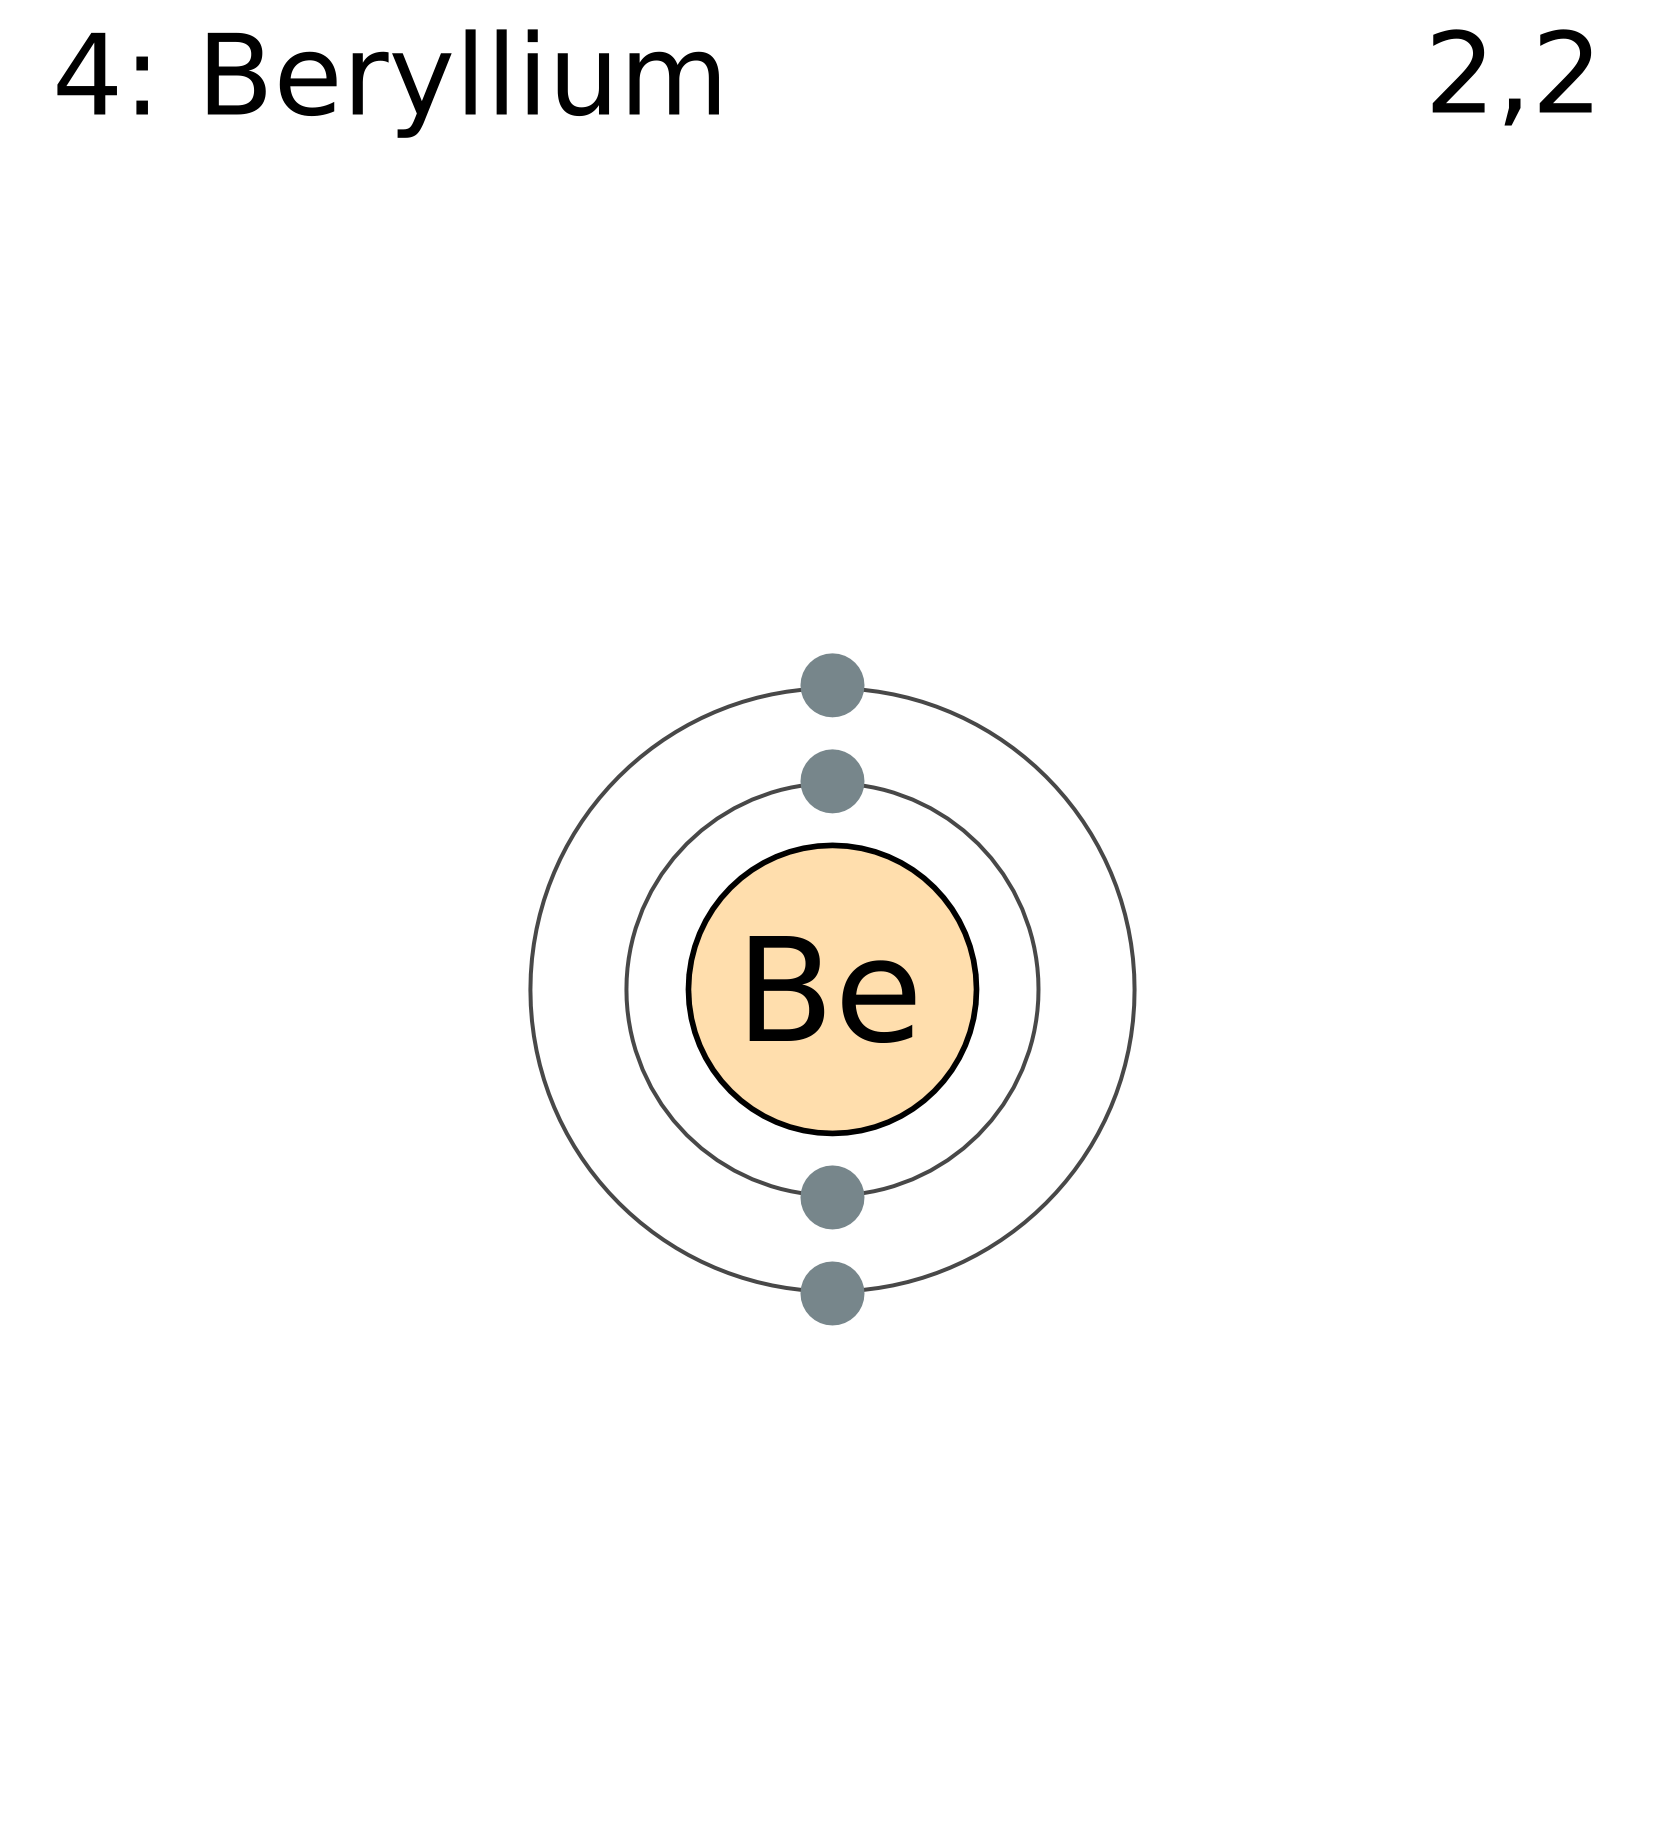 beryllium bohr model � file electron shell 004 beryllium